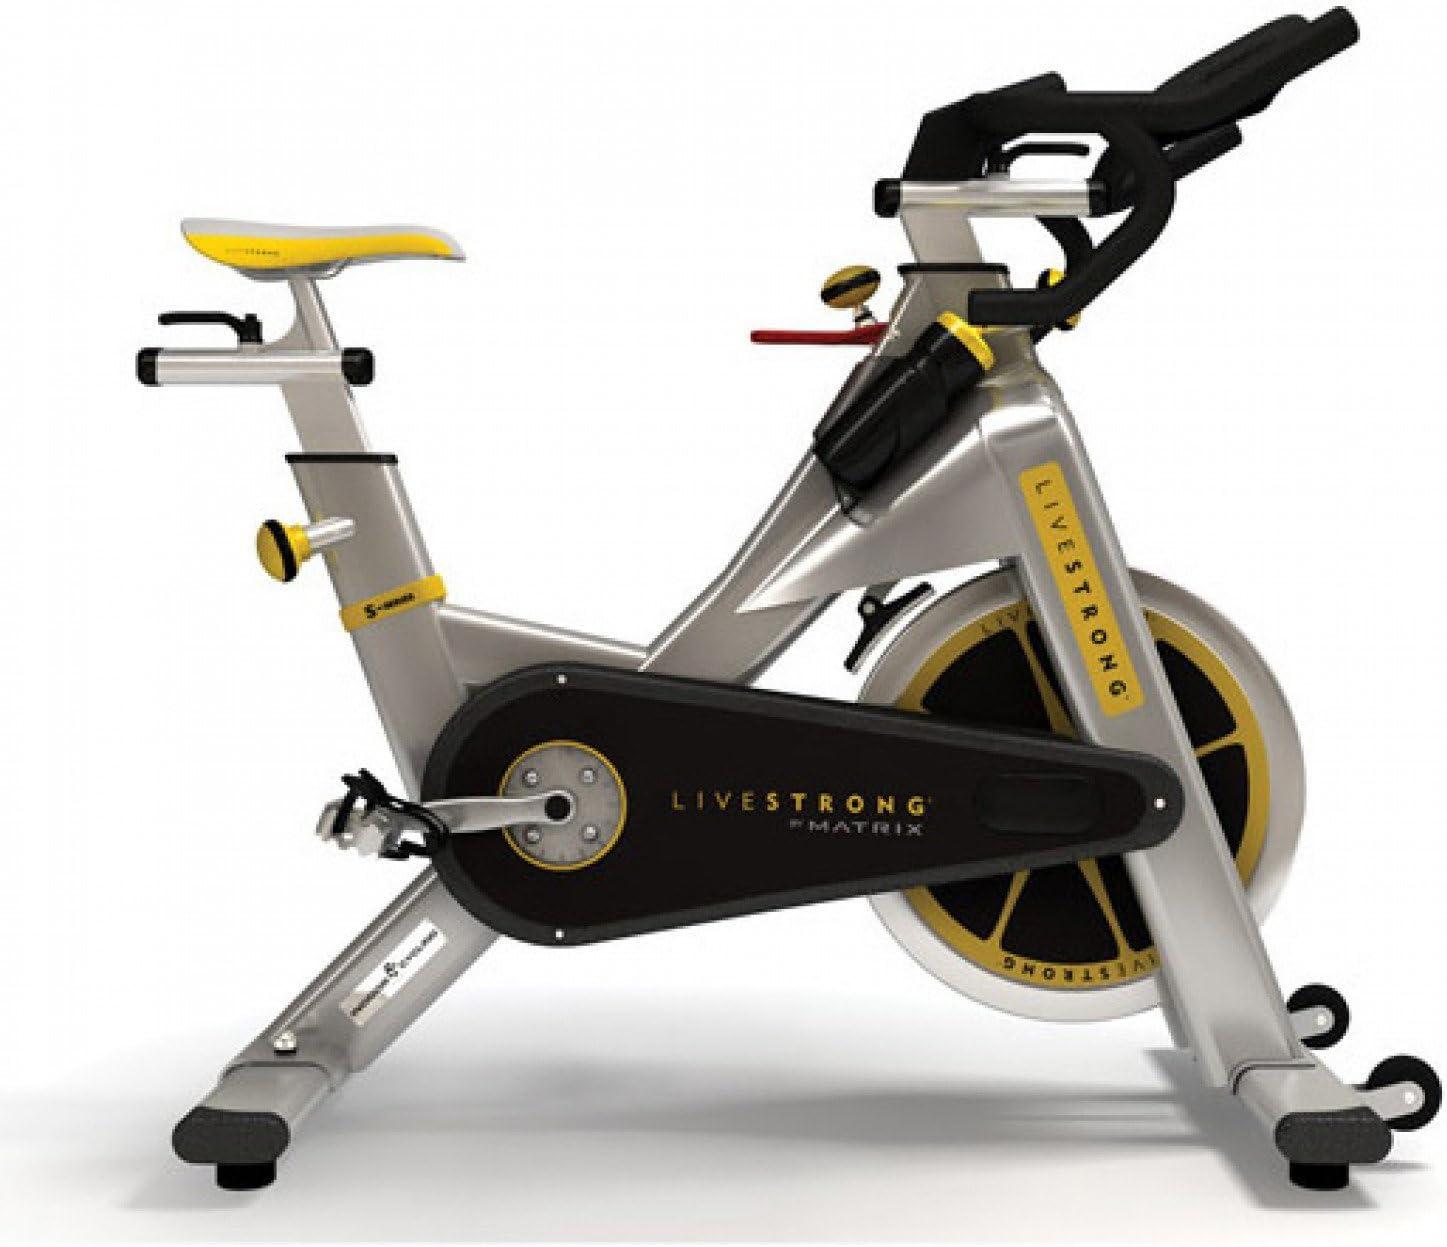 livestrong Unisex S Serie Studio, para Bicicleta, Multicolor ...